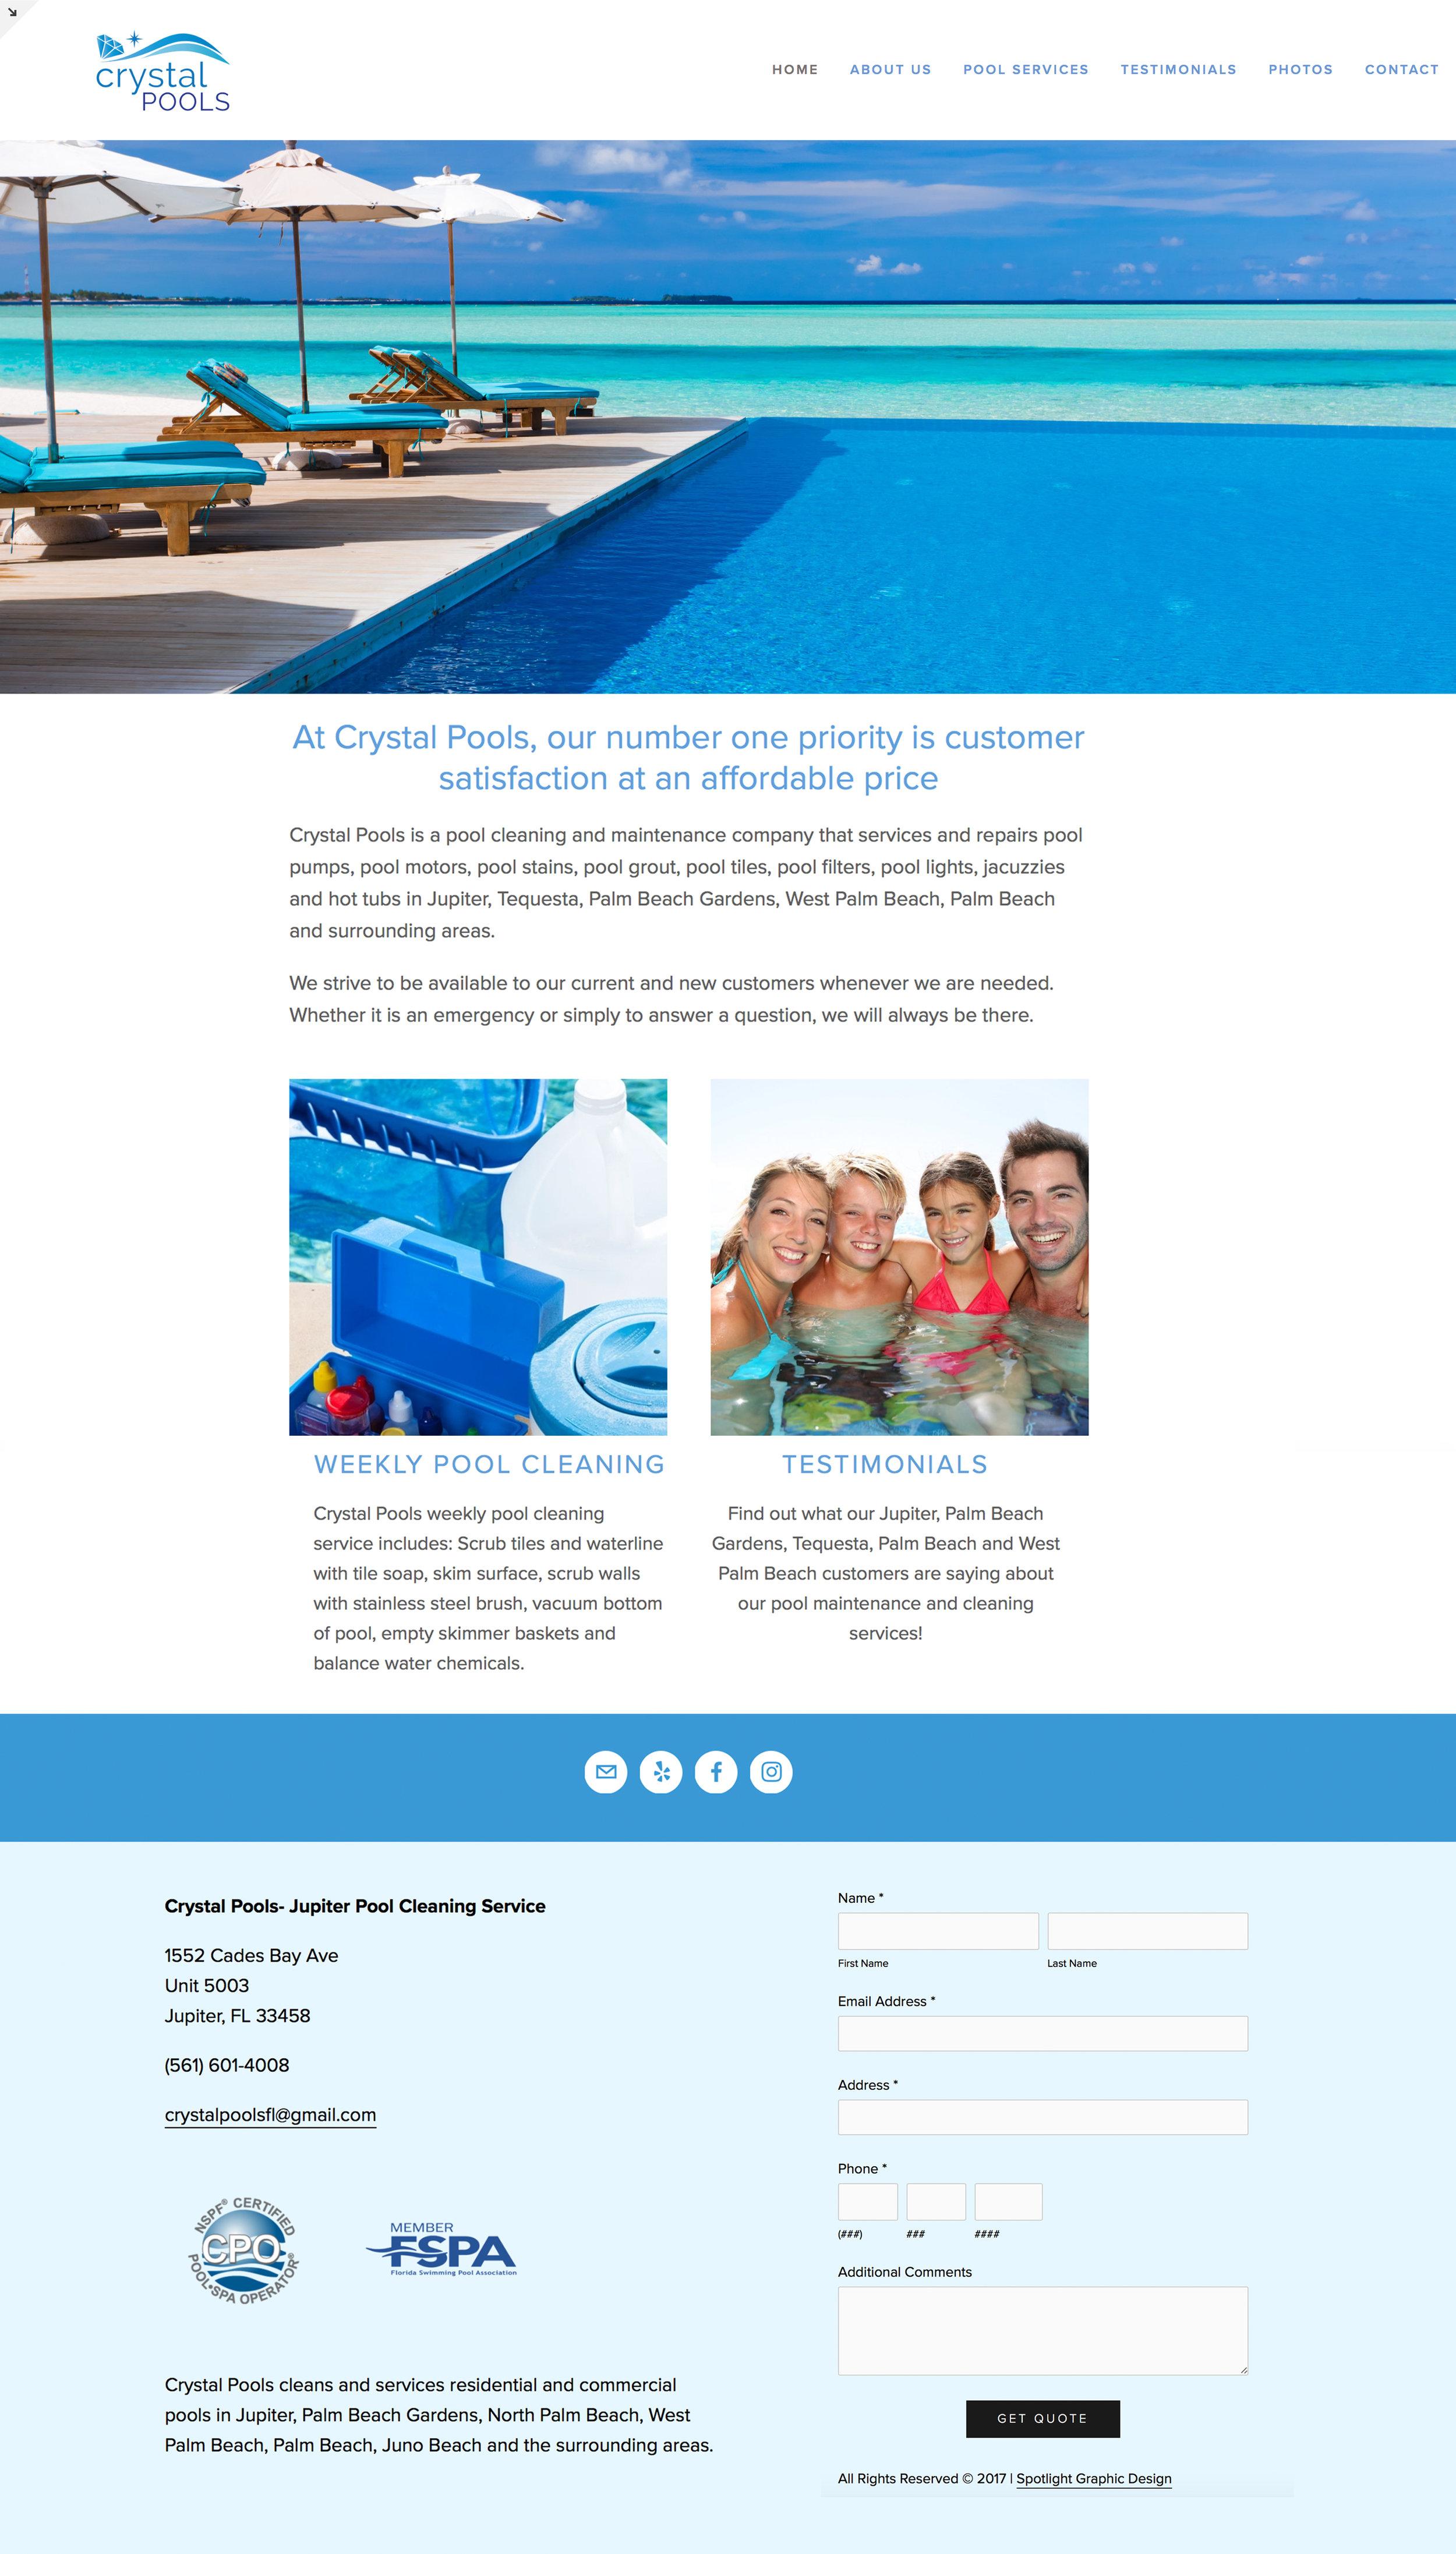 Crystal Pools Website Design